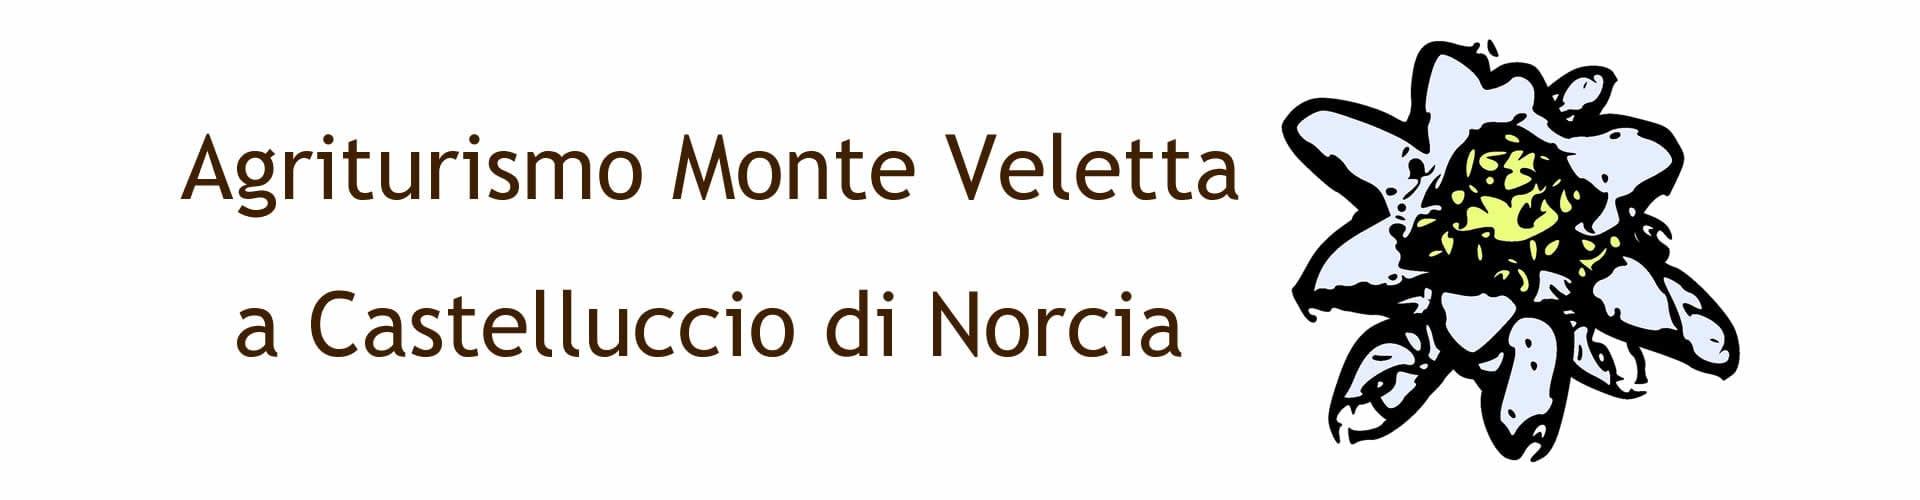 Agriturismo Monte Veletta - Castelluccio di Norcia